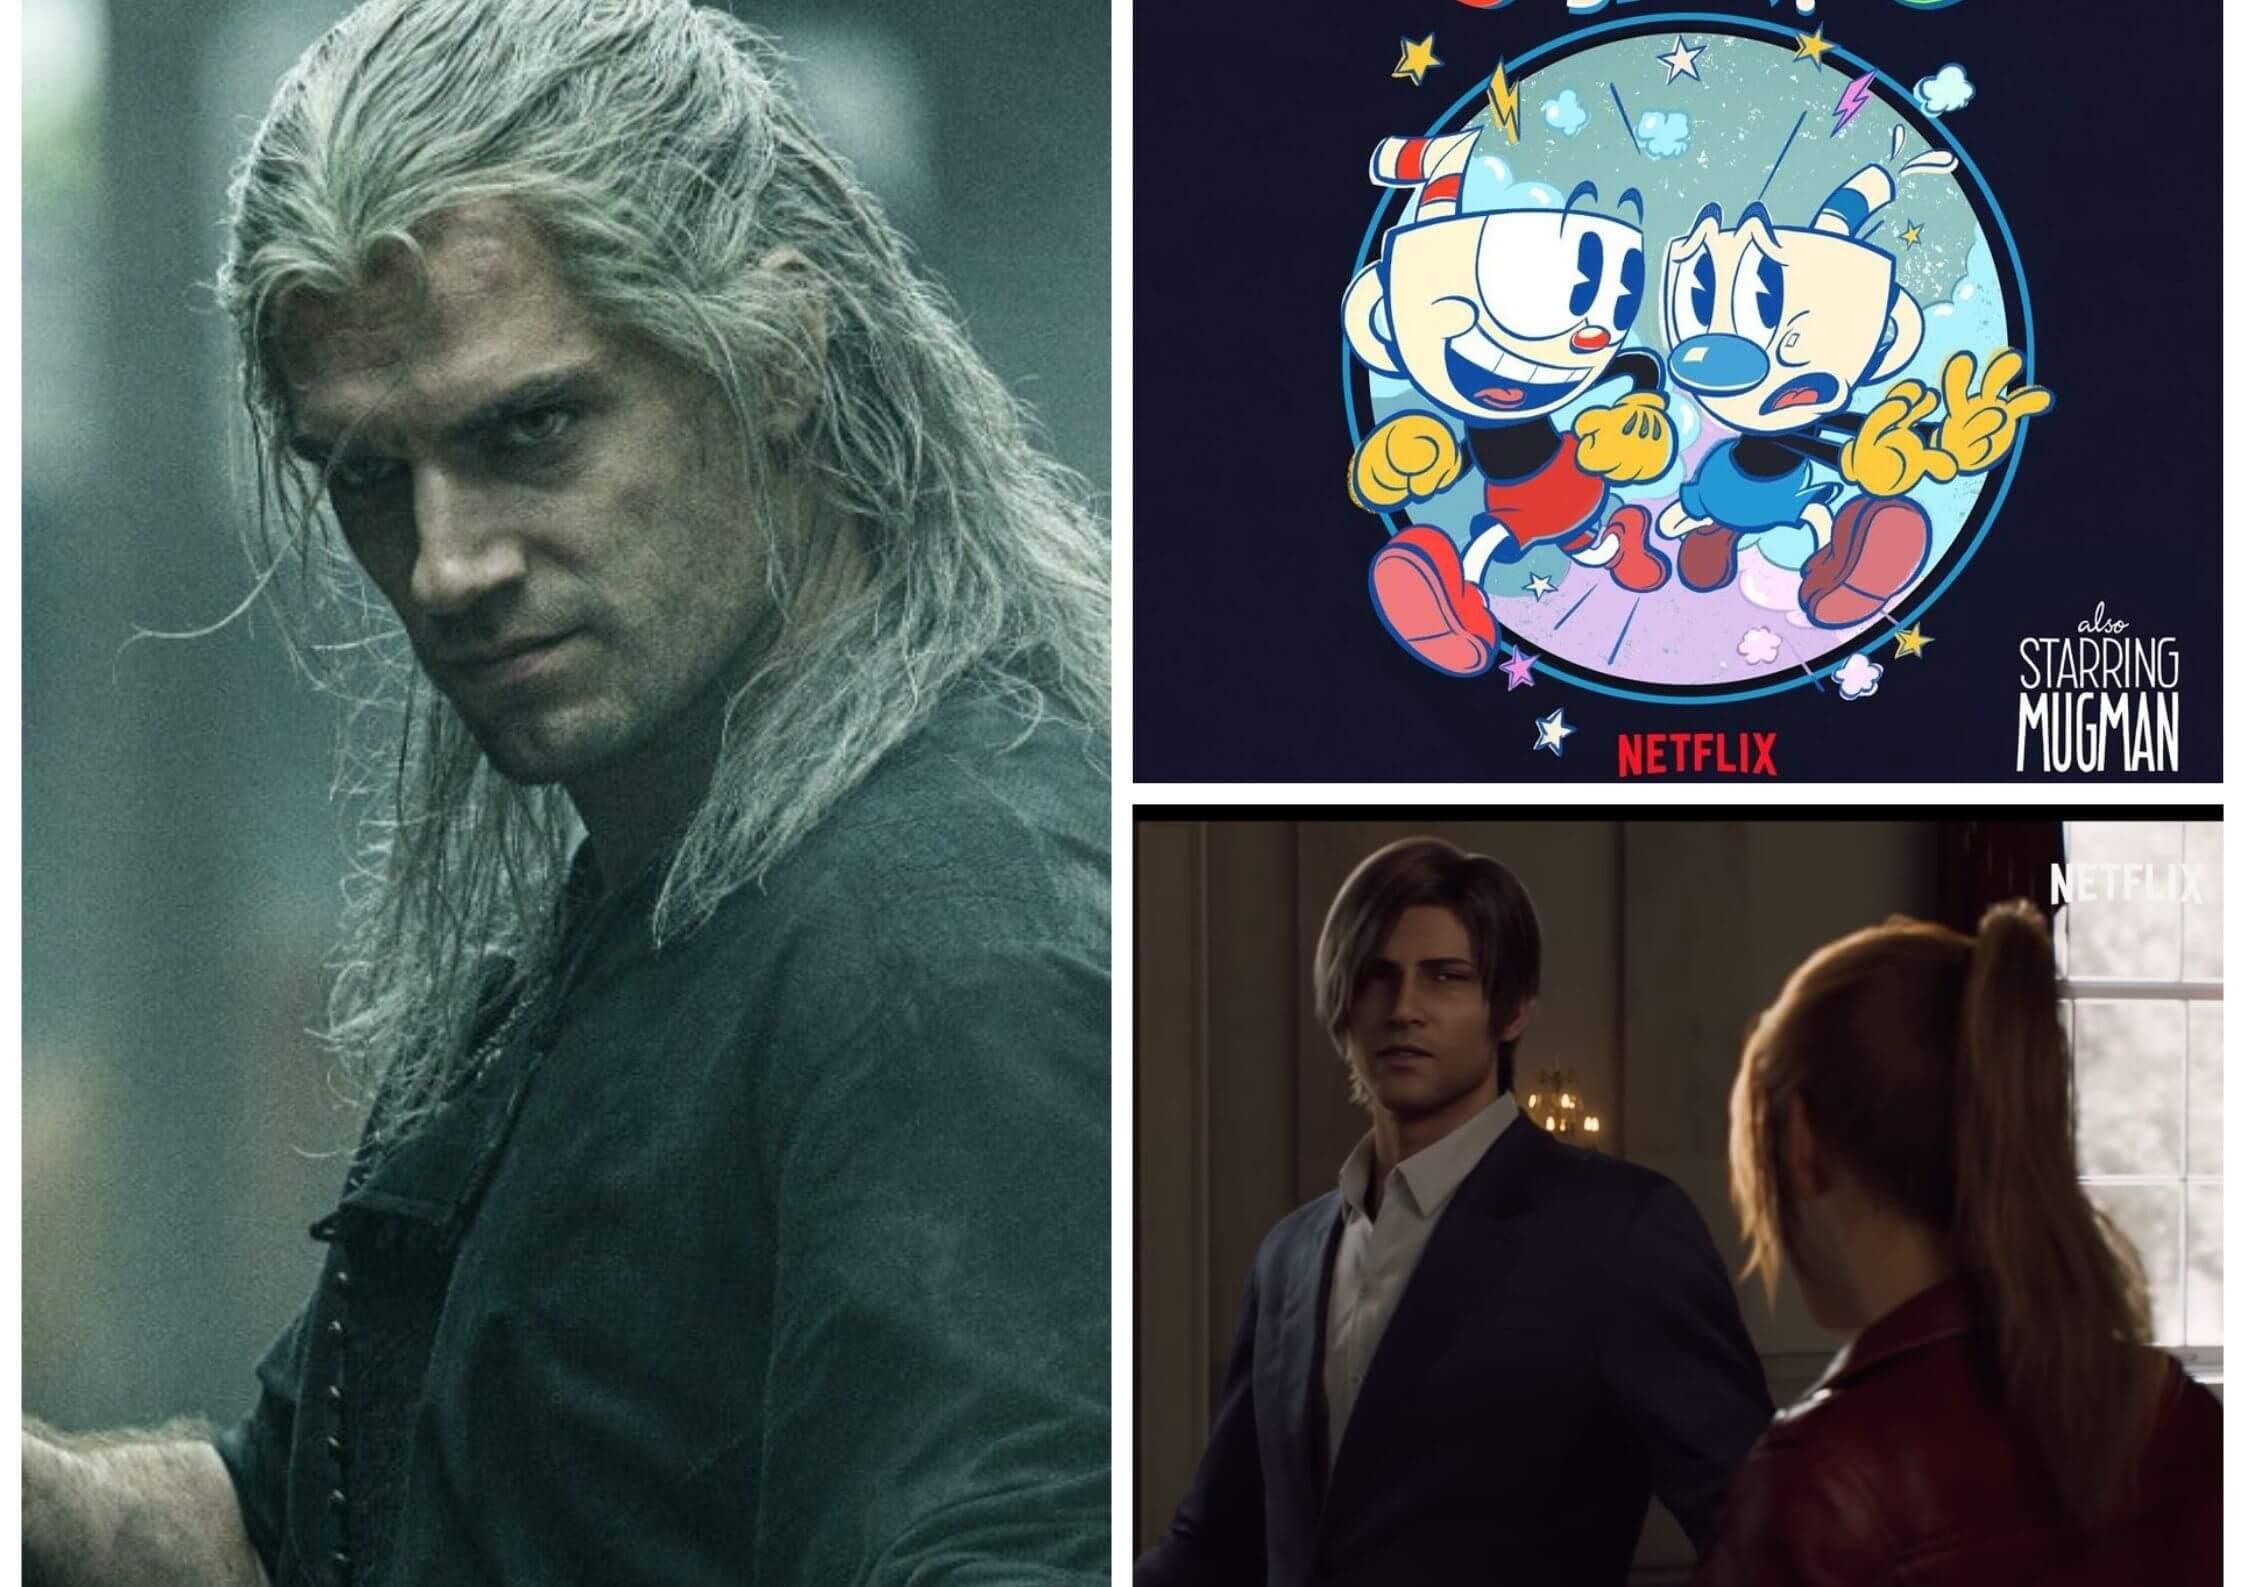 El Summer Game Fest revelará novedades de las series de The Witcher, Resident Evil y Cuphead